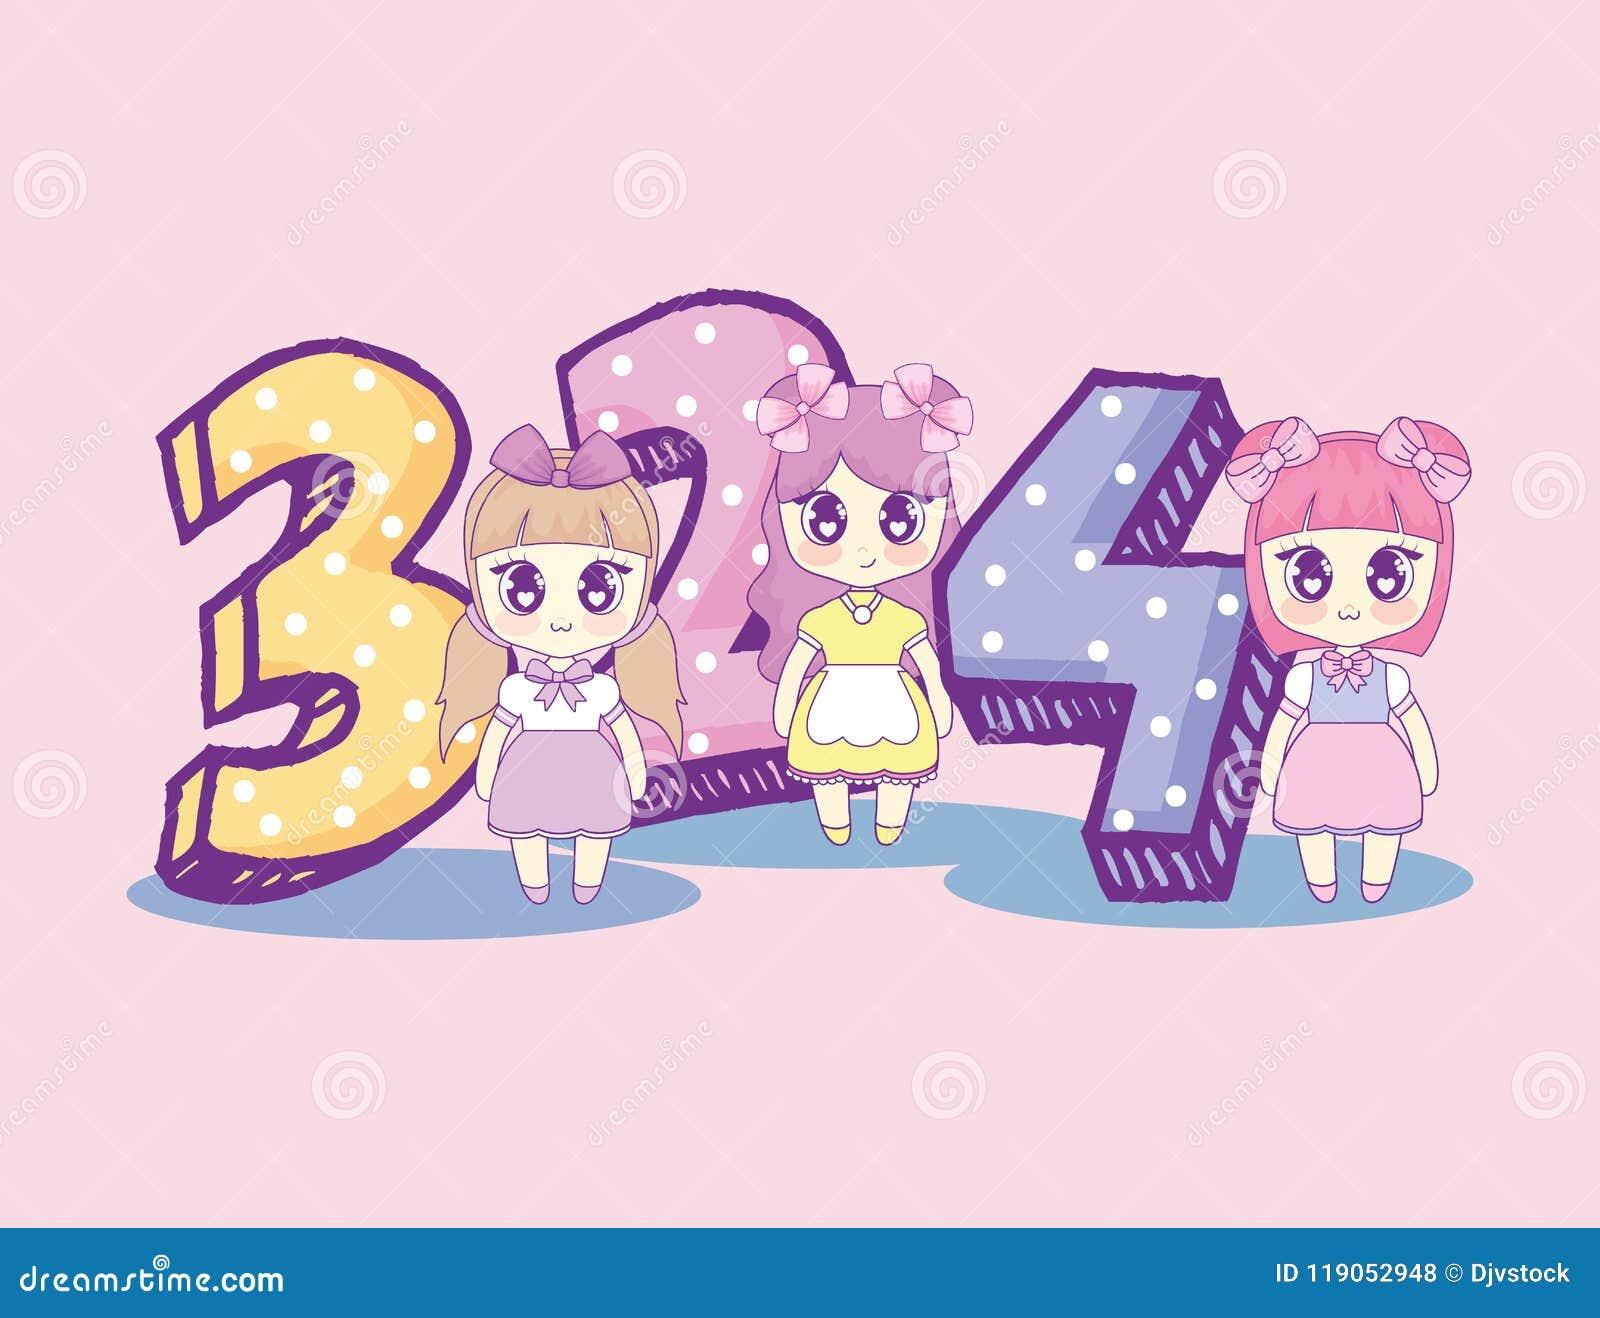 Kawaii Girls With Number Birthday Card